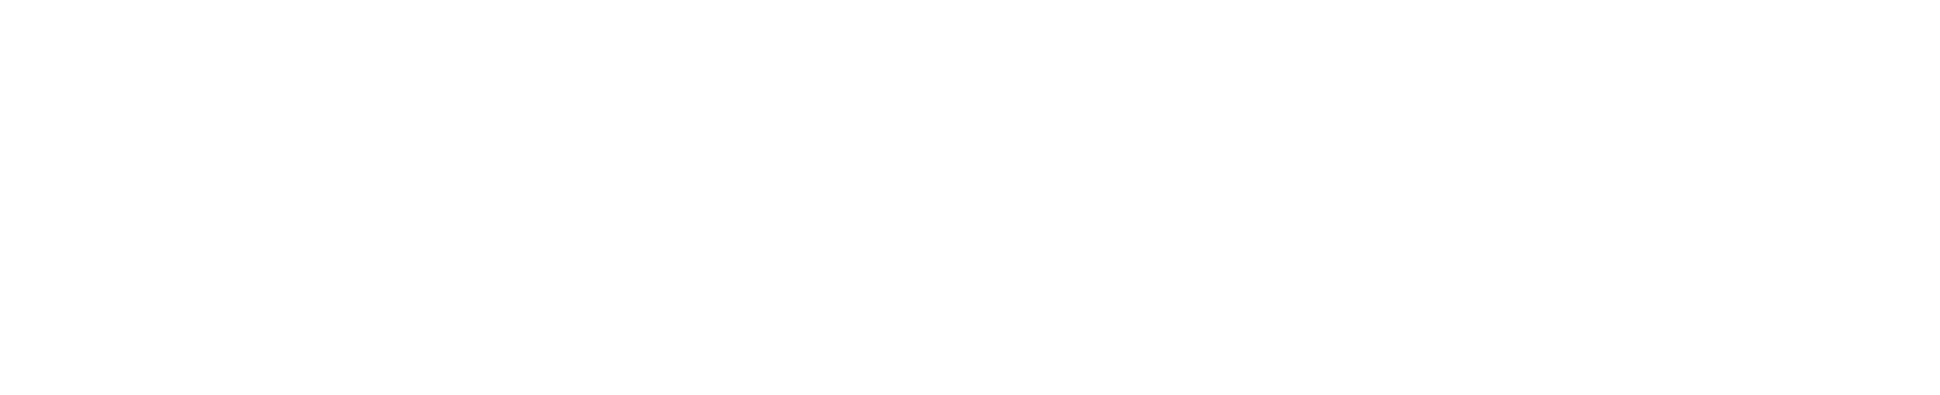 Legend-Kayaks---Trident-Logo-White